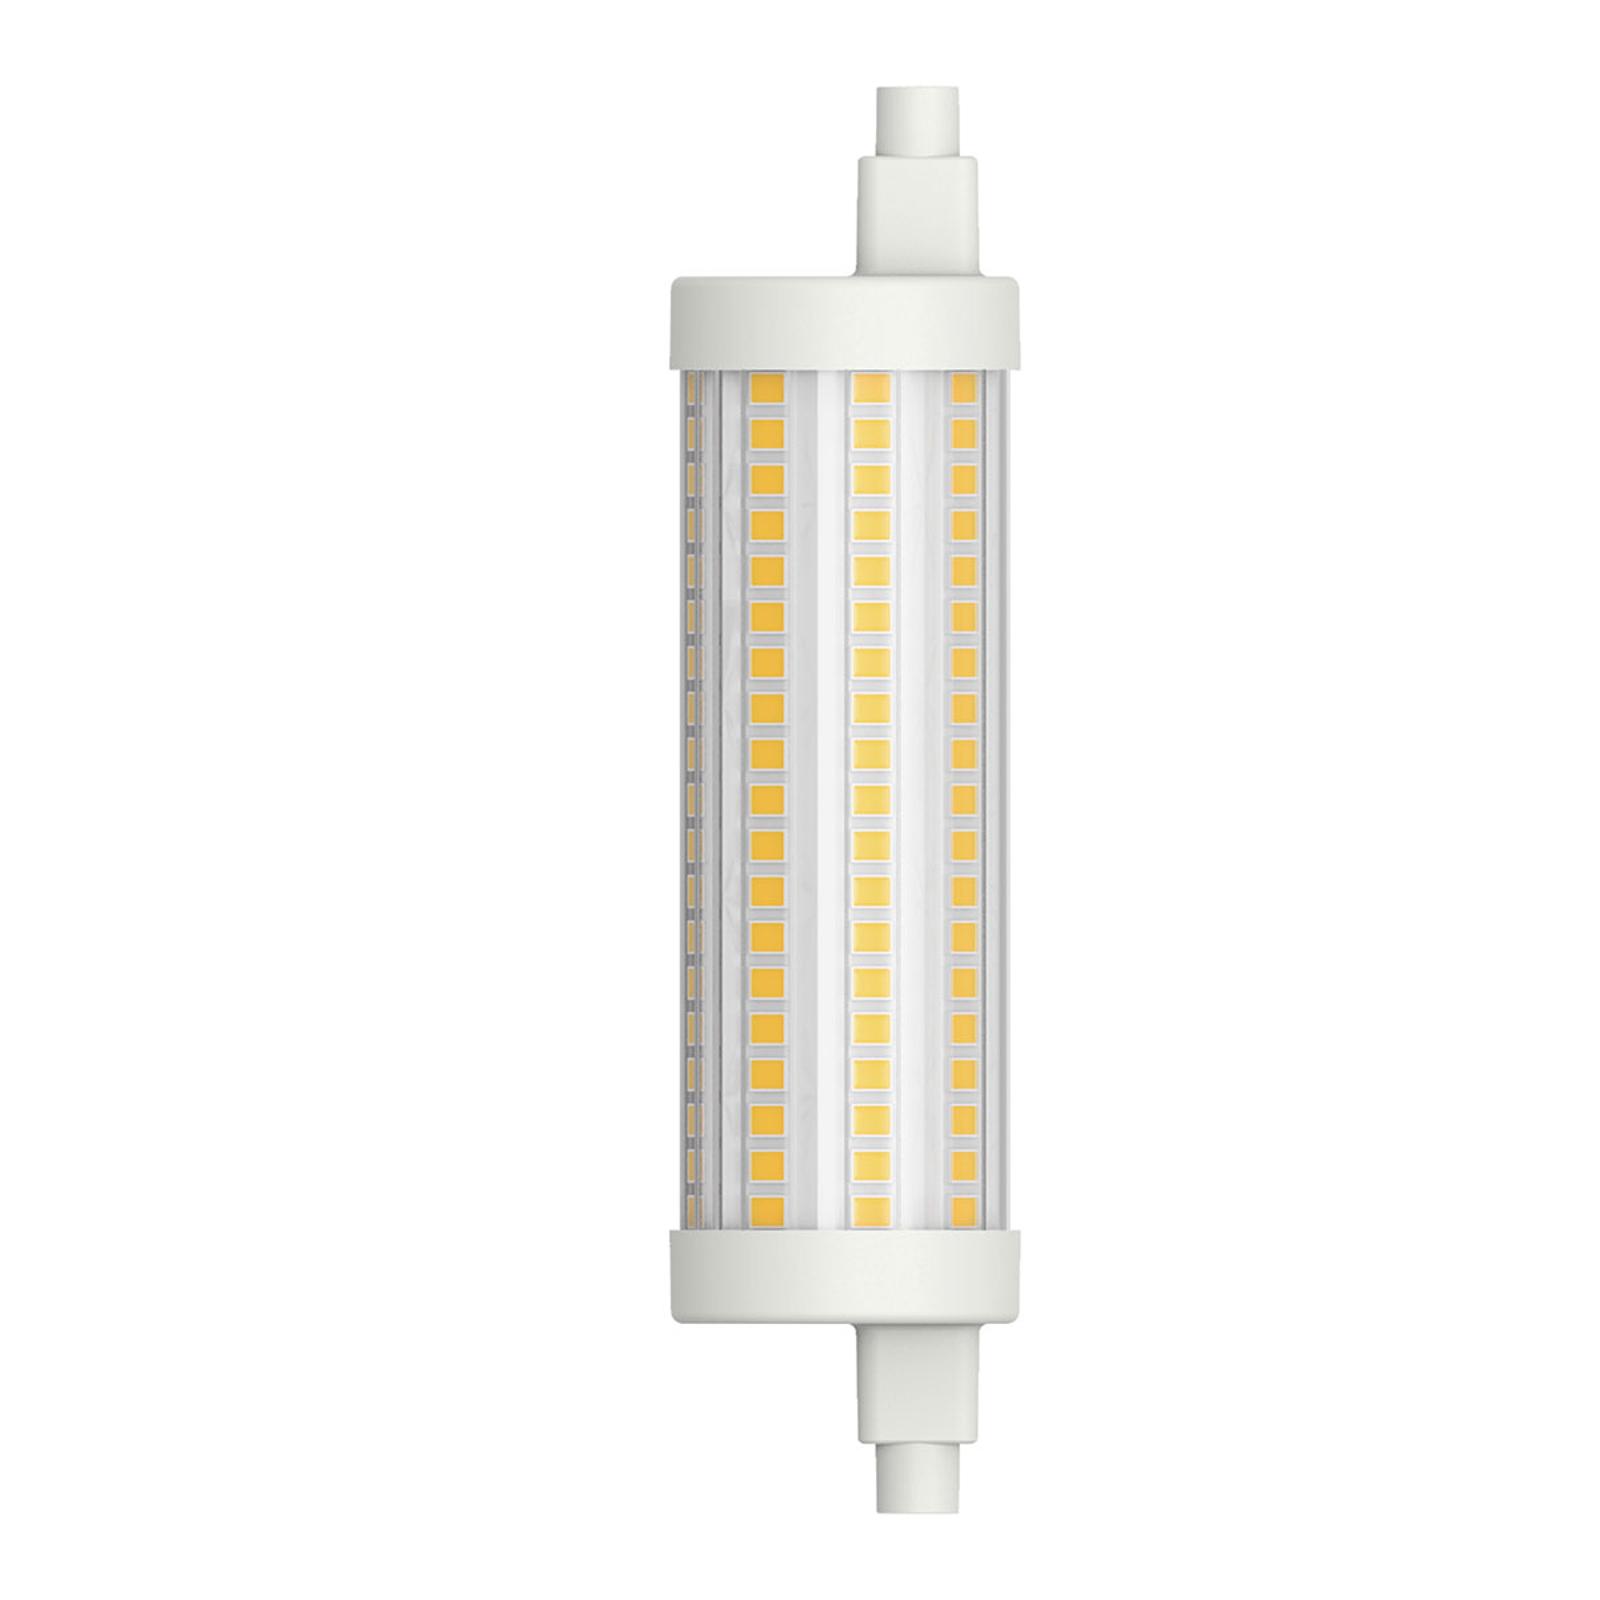 LED tubolare R7s 117,6 mm 15W bianco caldo dimming